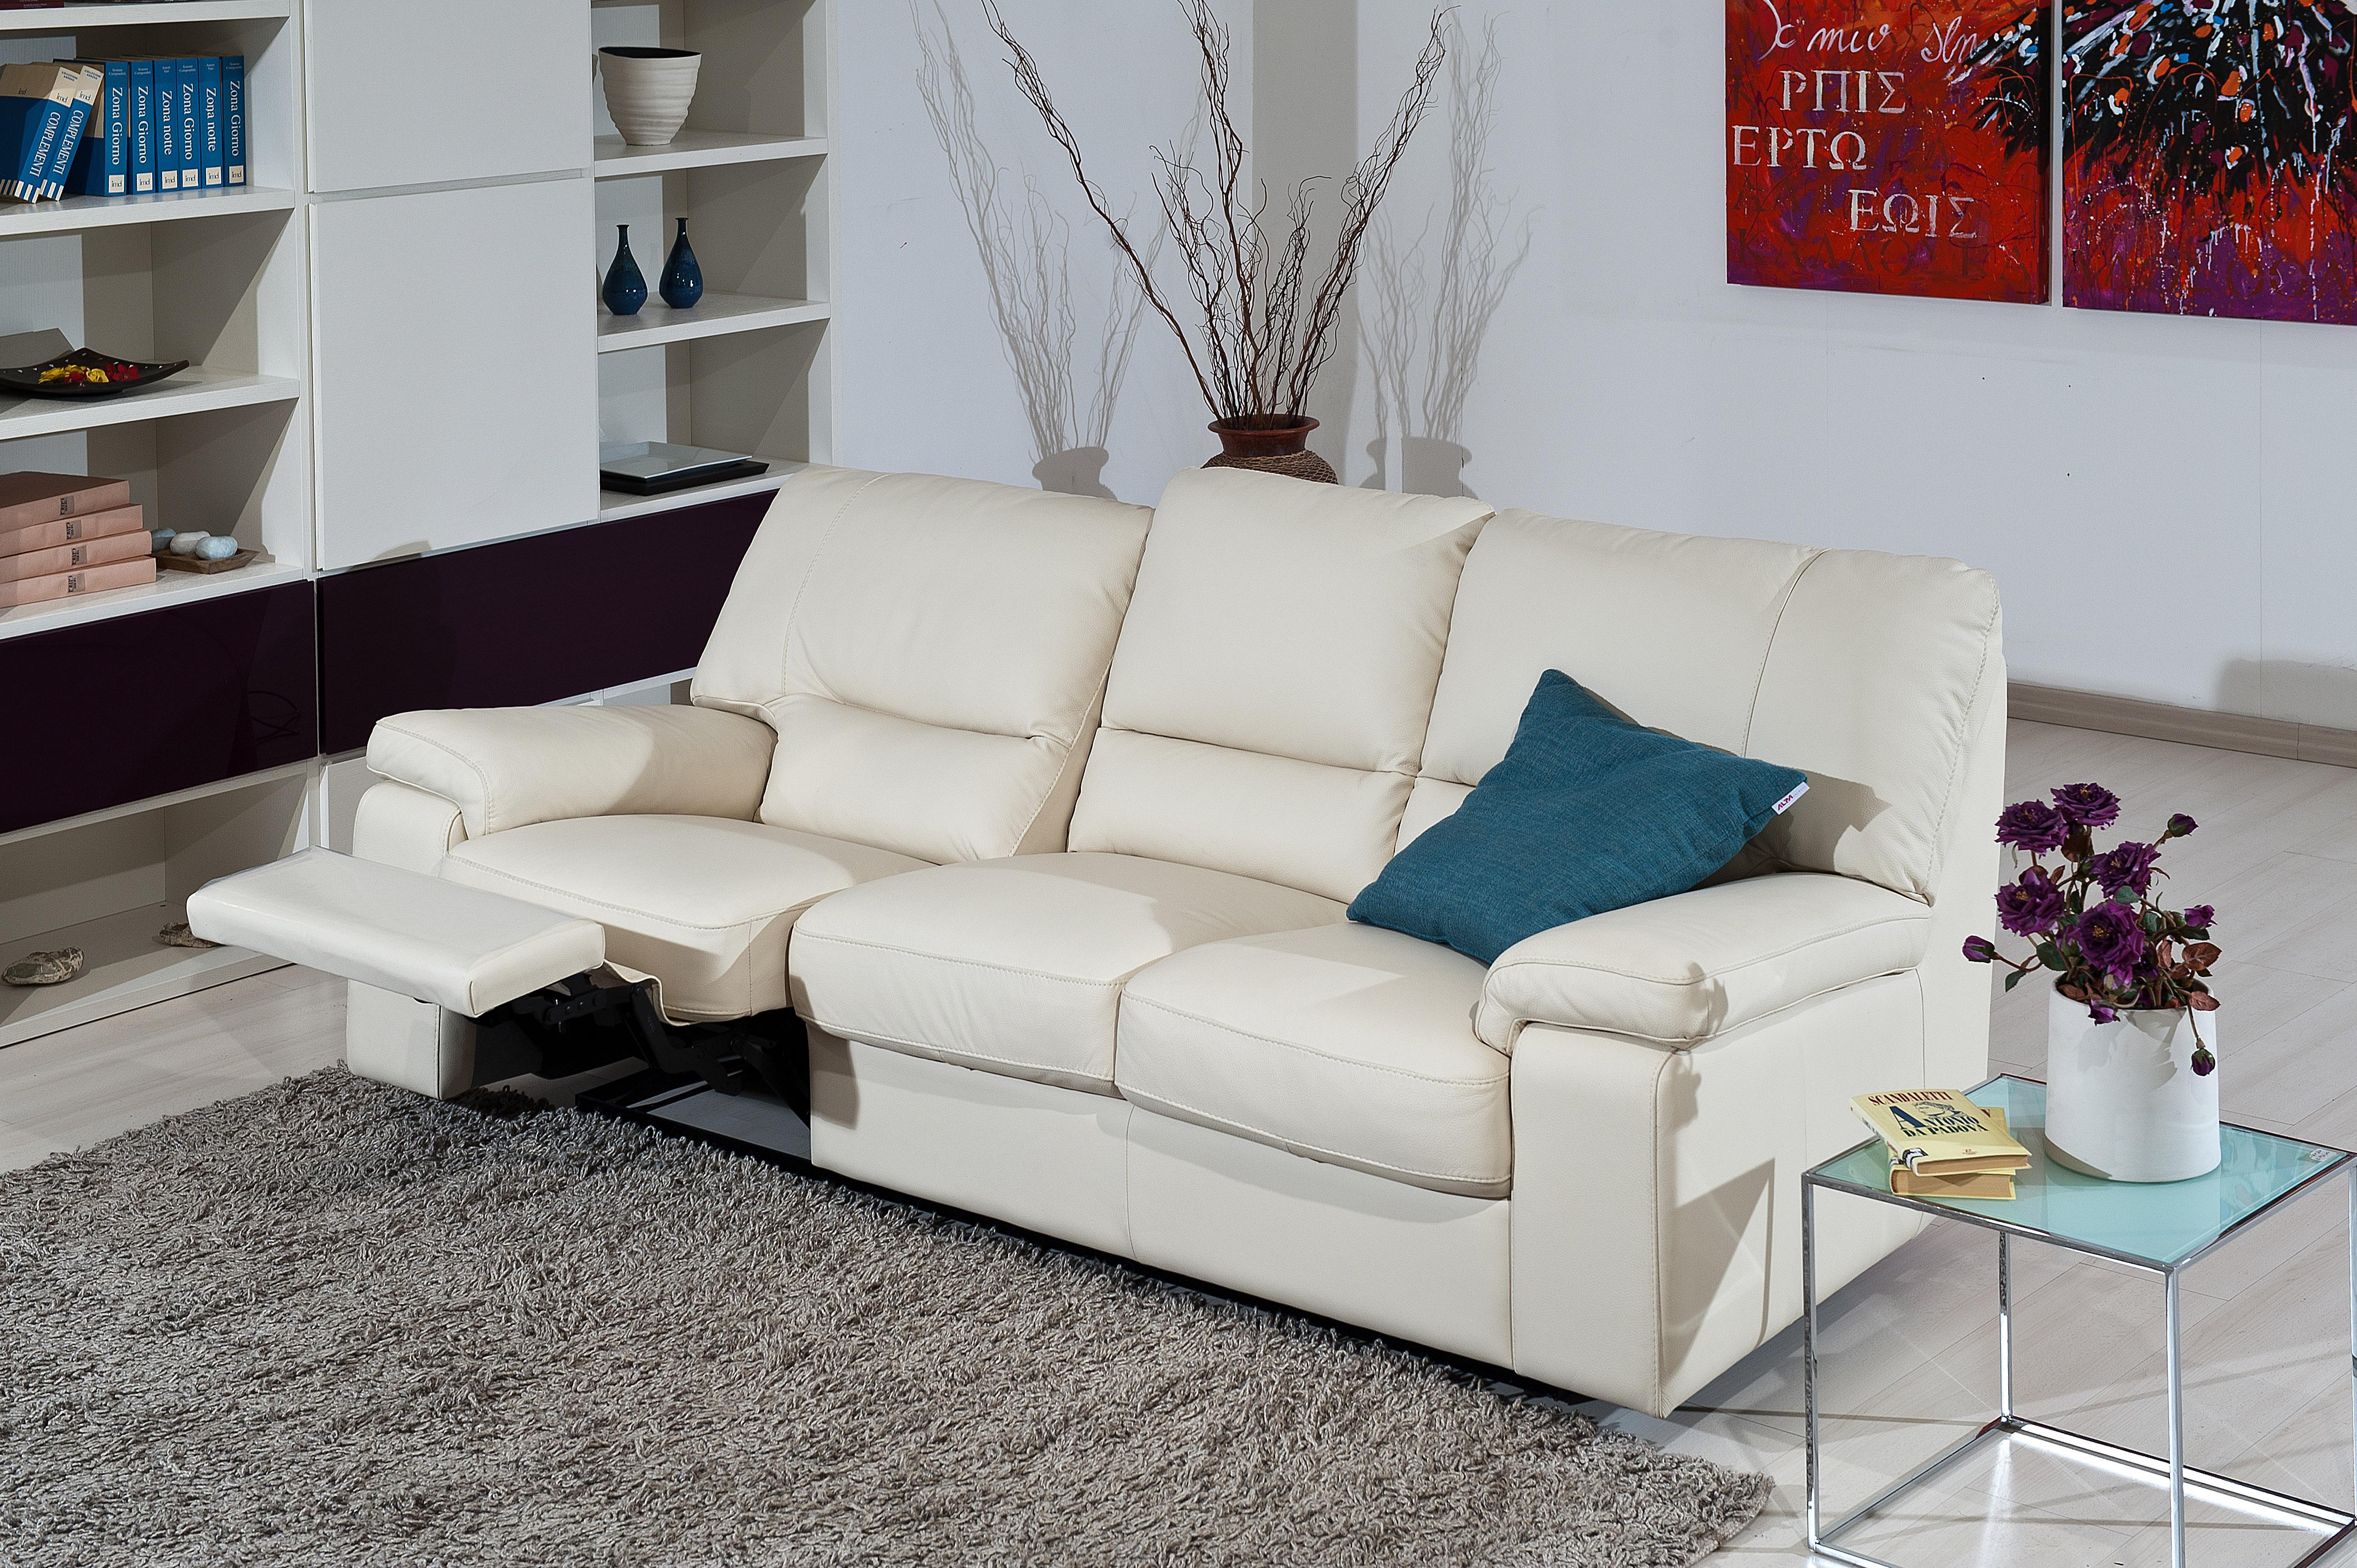 Luxor Italian Leather Sofa Set With Sliding Seats